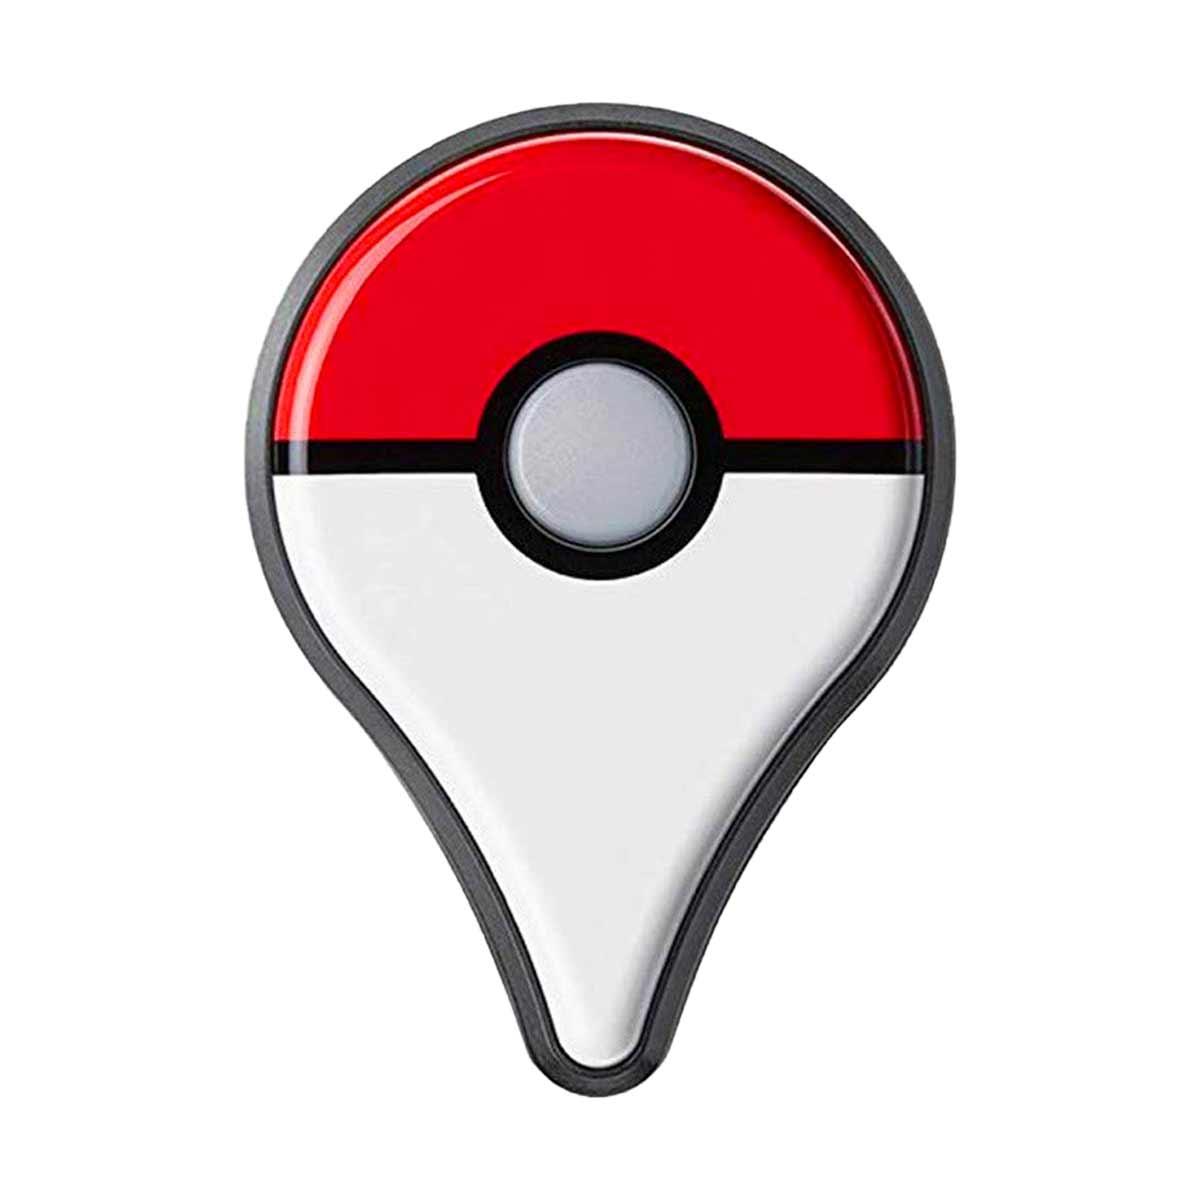 Cover Seal Case for Pokemon GO PLUS